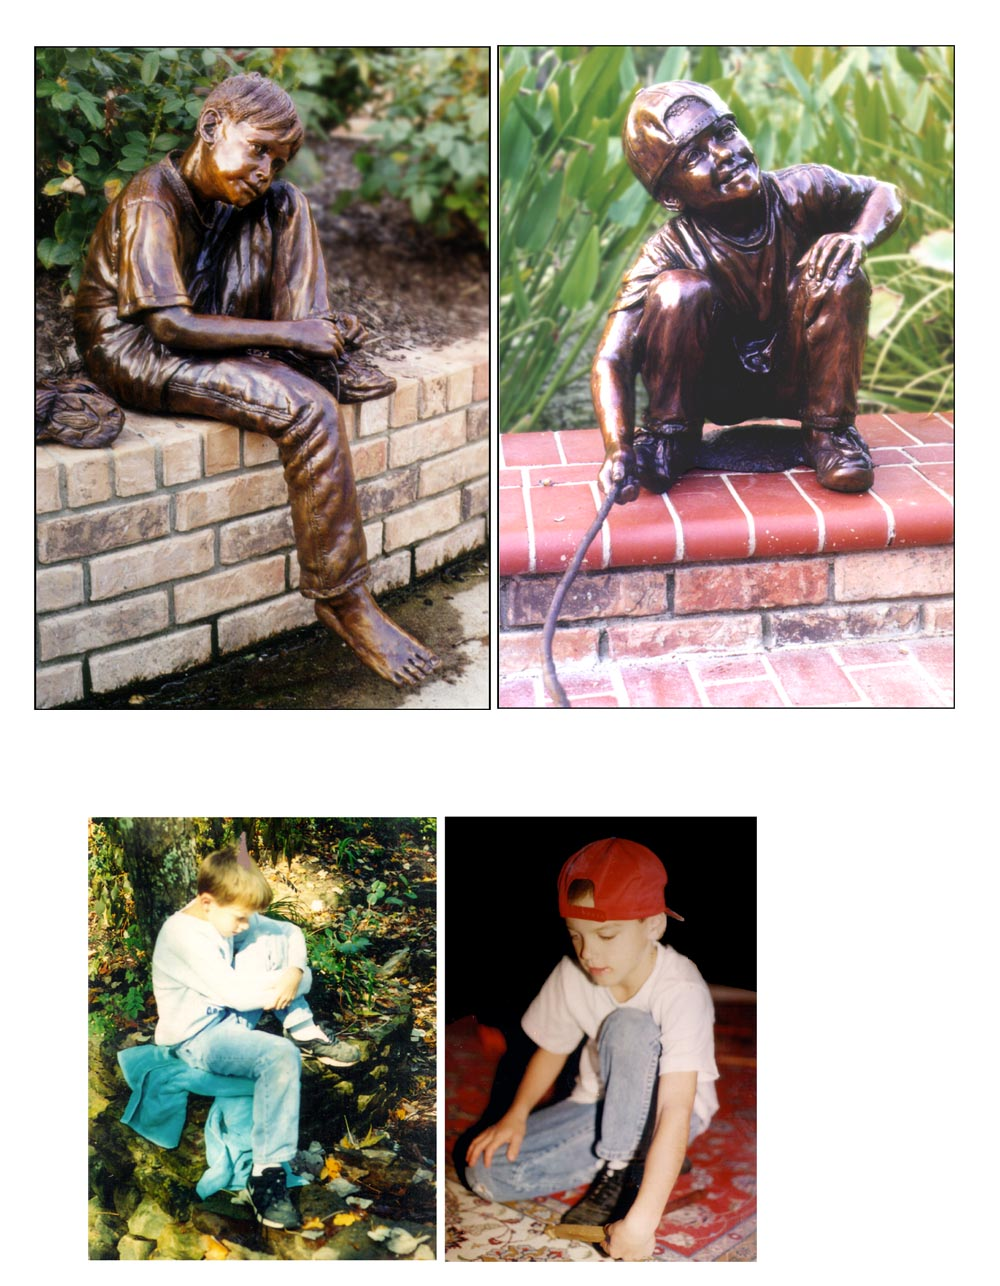 Bridgette mongeon specializes in sculpting children